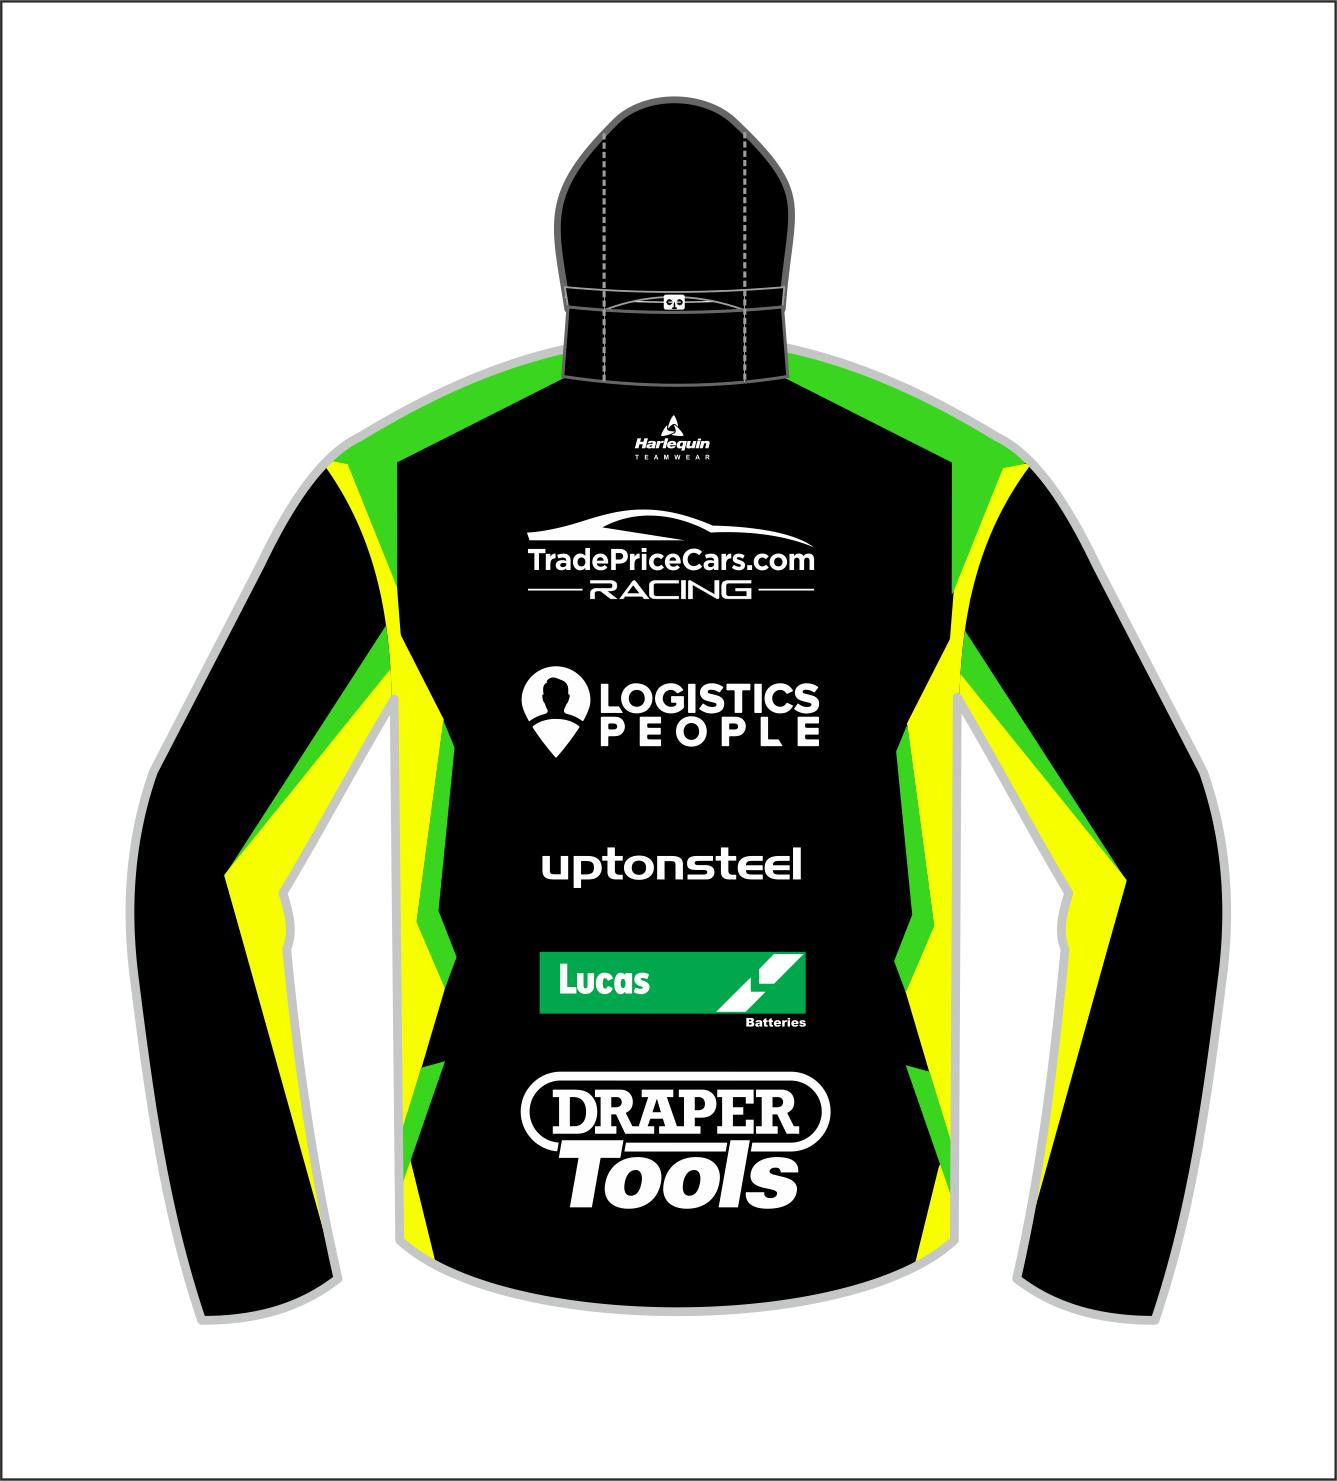 2021 Excelr8 TradePriceCars Rain Jacket (Yellow & Green)